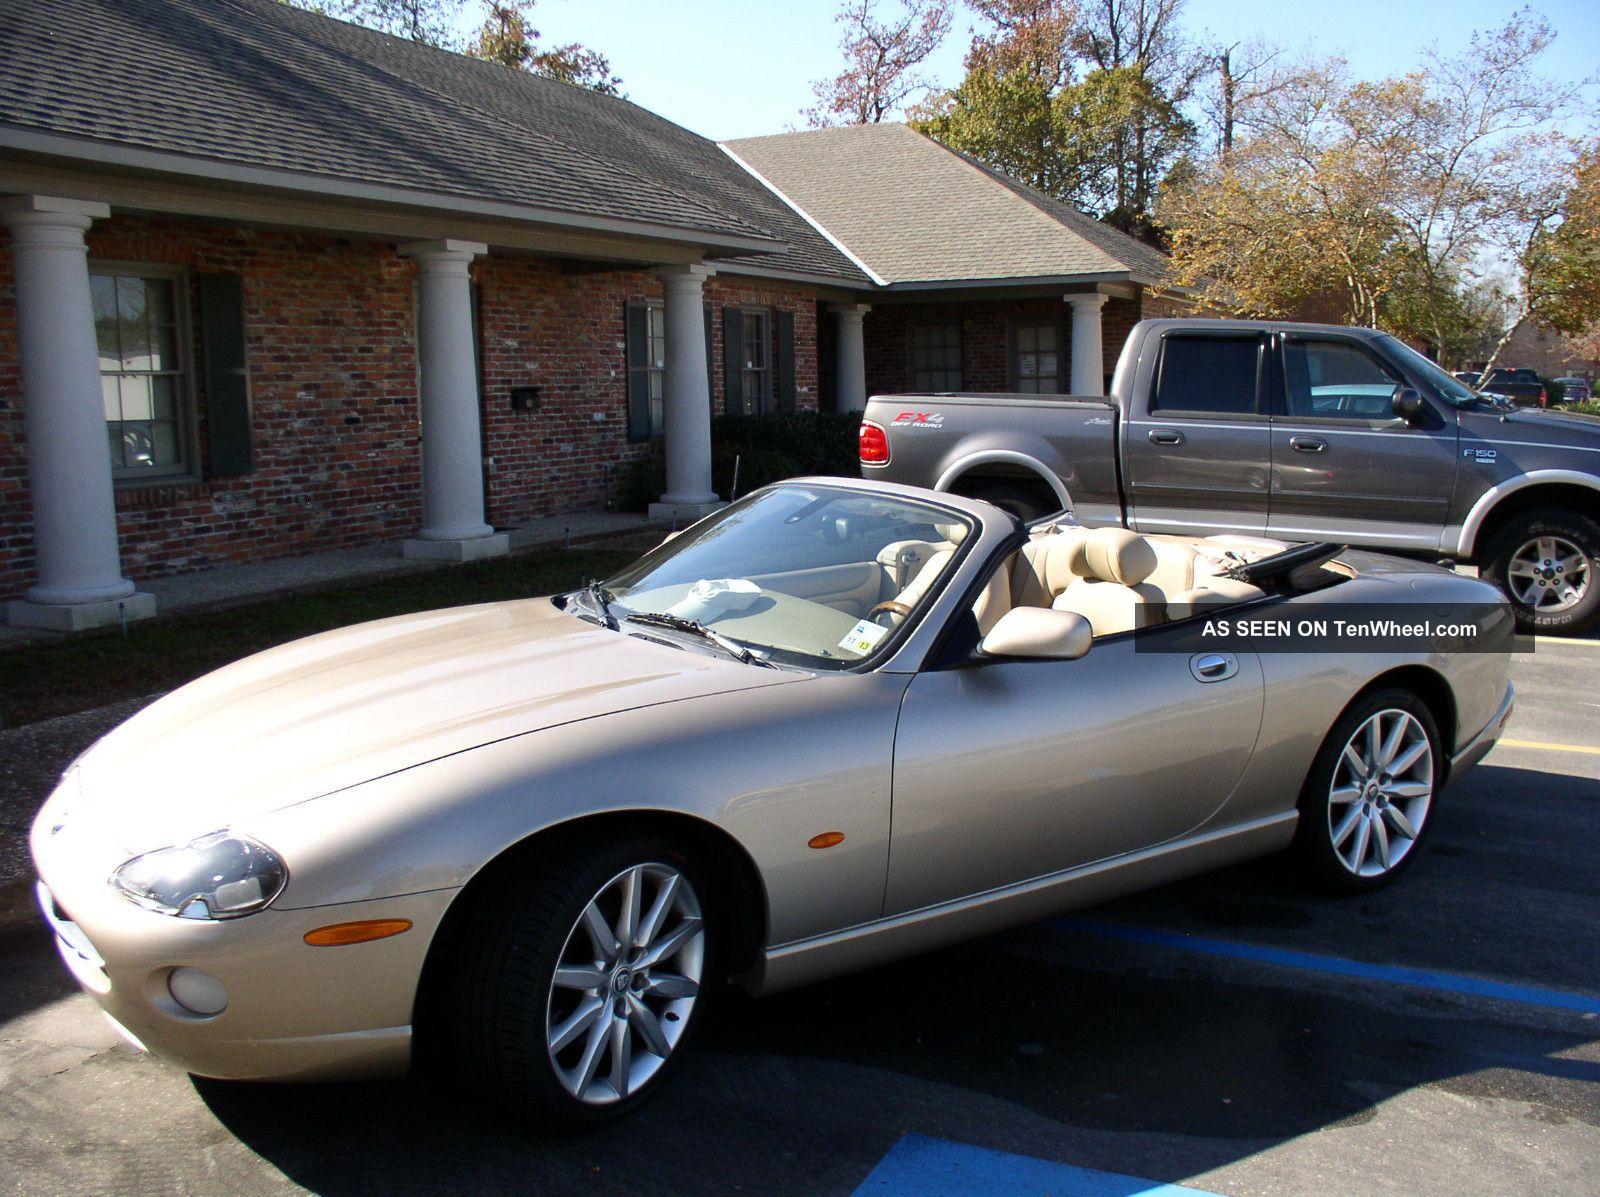 2005 pristine jaguar xk8 champagne convertible. Black Bedroom Furniture Sets. Home Design Ideas